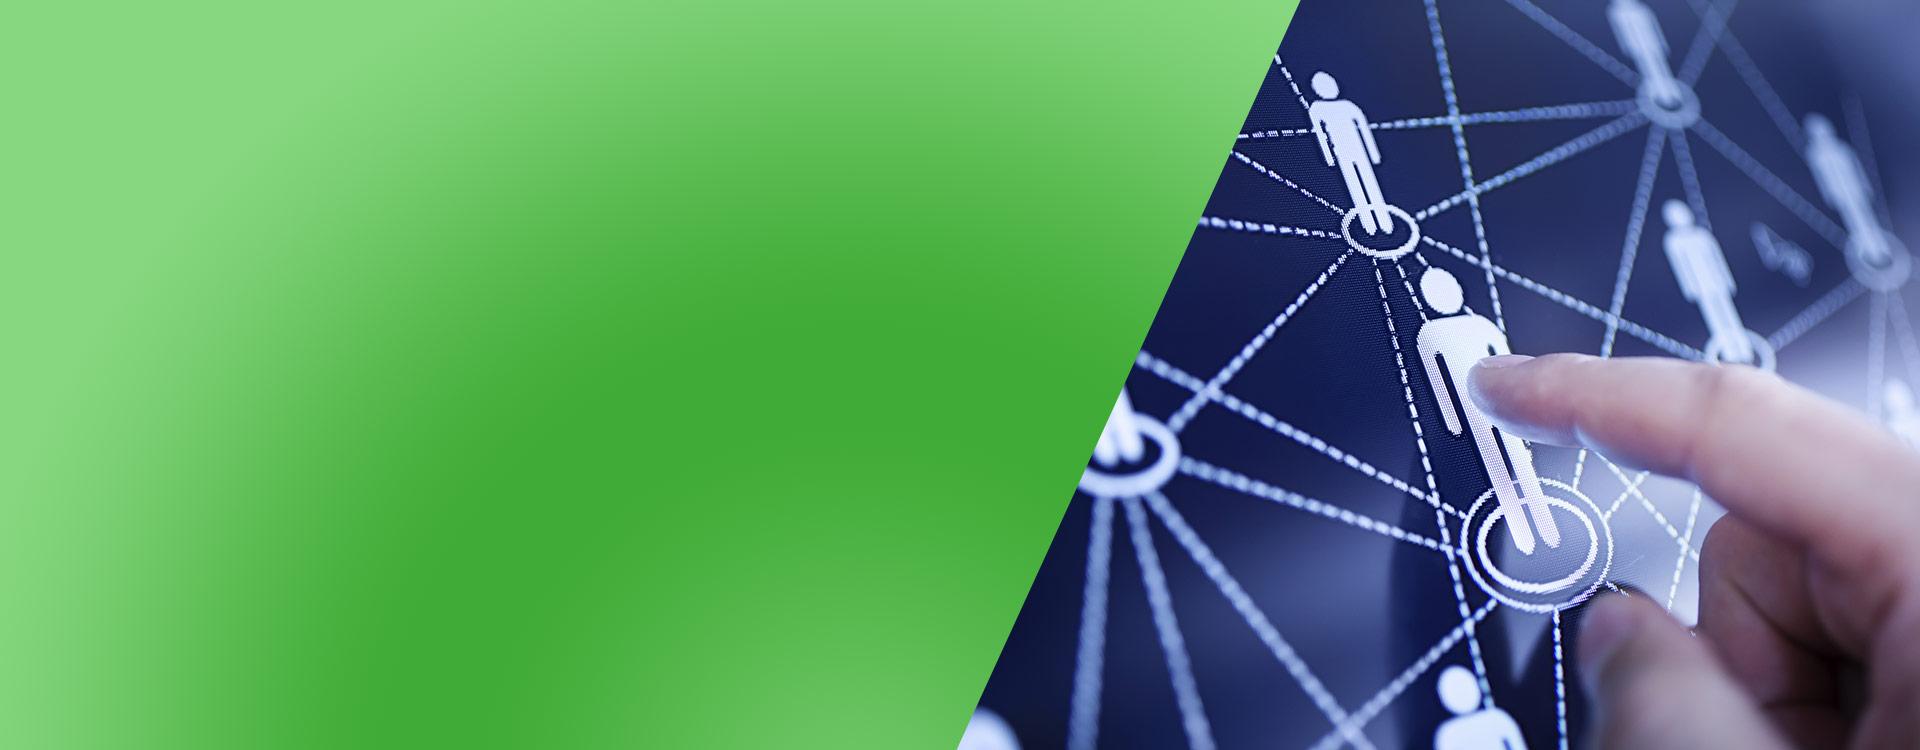 AccountScience-Header-Green-1